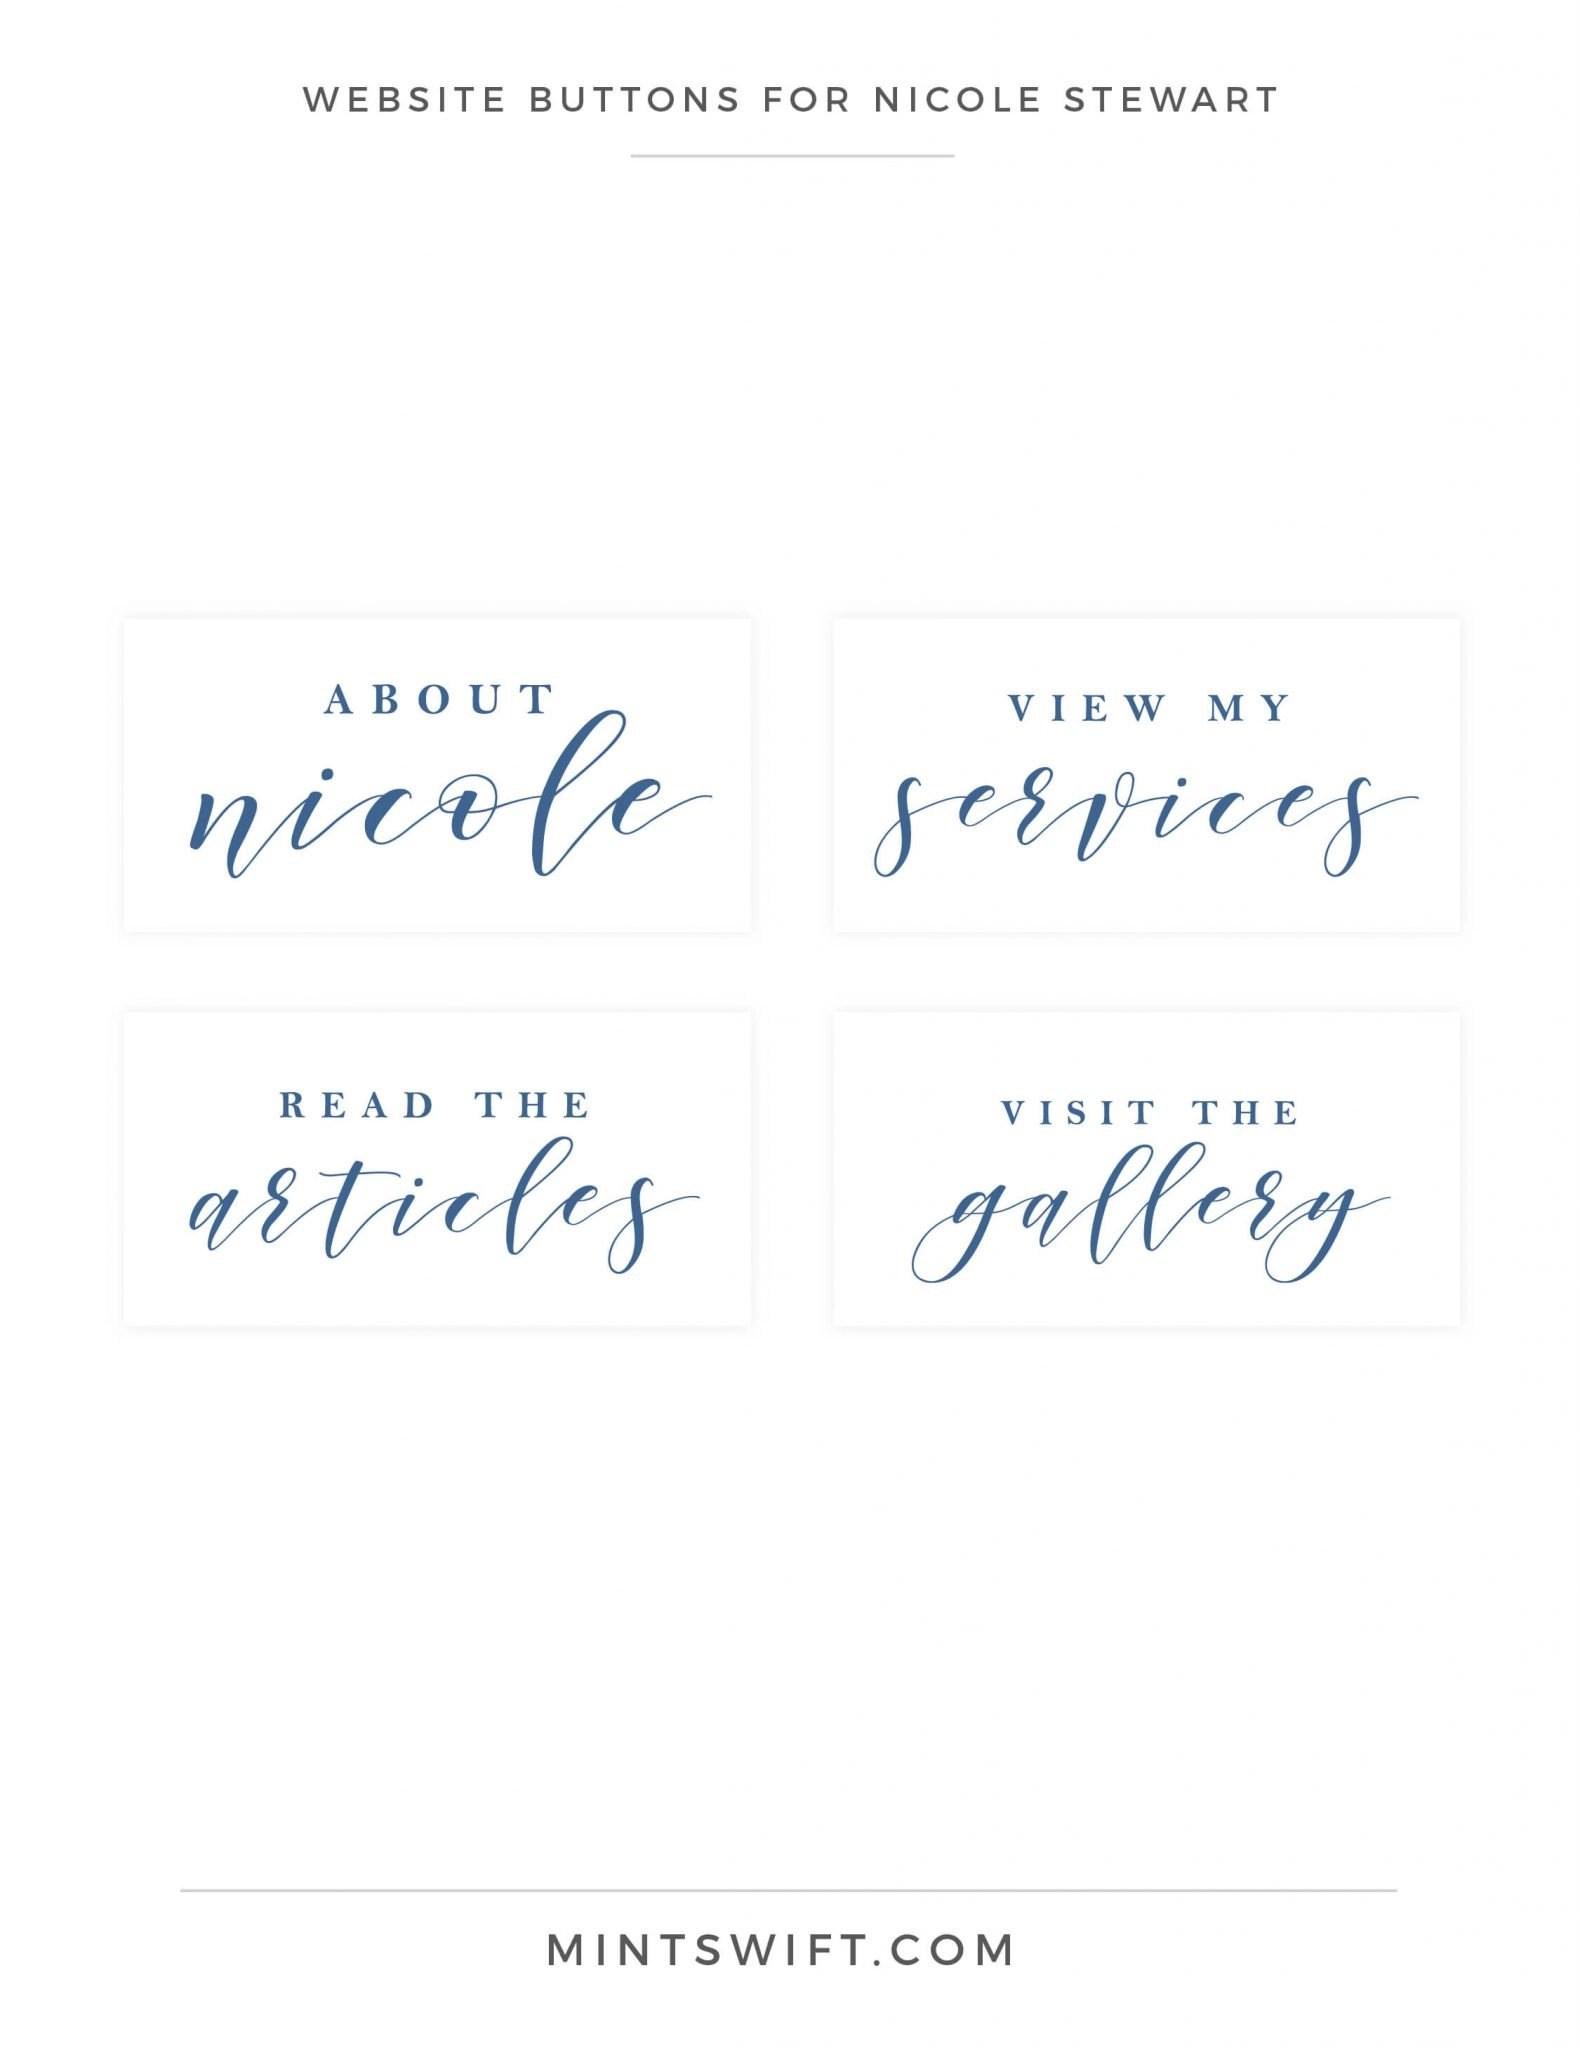 Nicole Stewart - Website Buttons - Brand Design Package - MintSwift